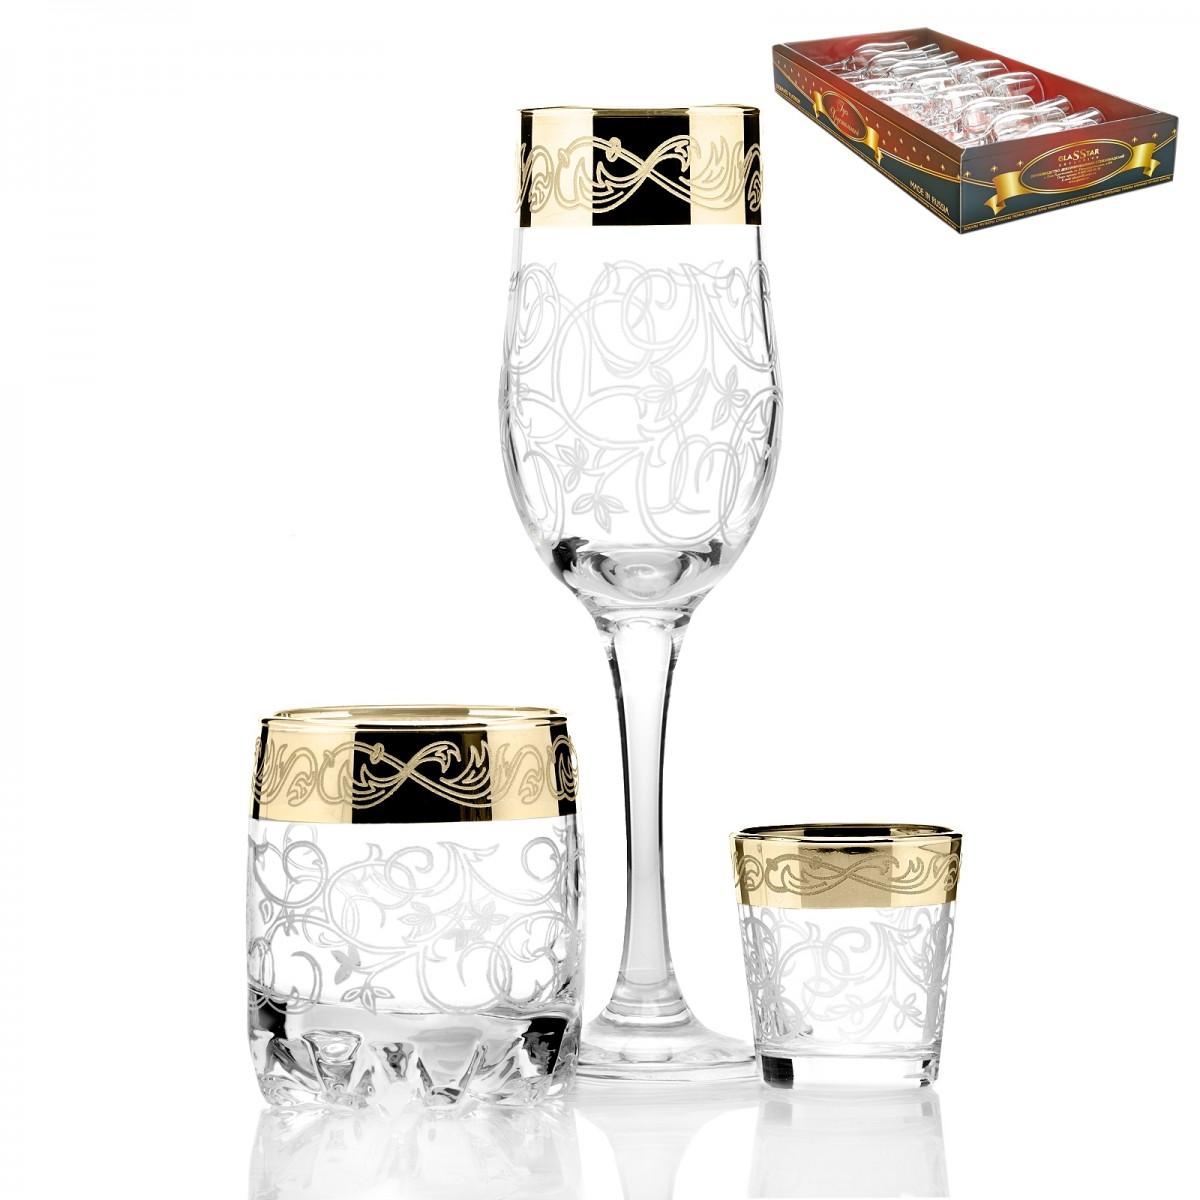 GN2_160_414_50 Набор 18 предметов «Вдохновение» (6 бокалов + 6 стаканов виски + 6 стопок)